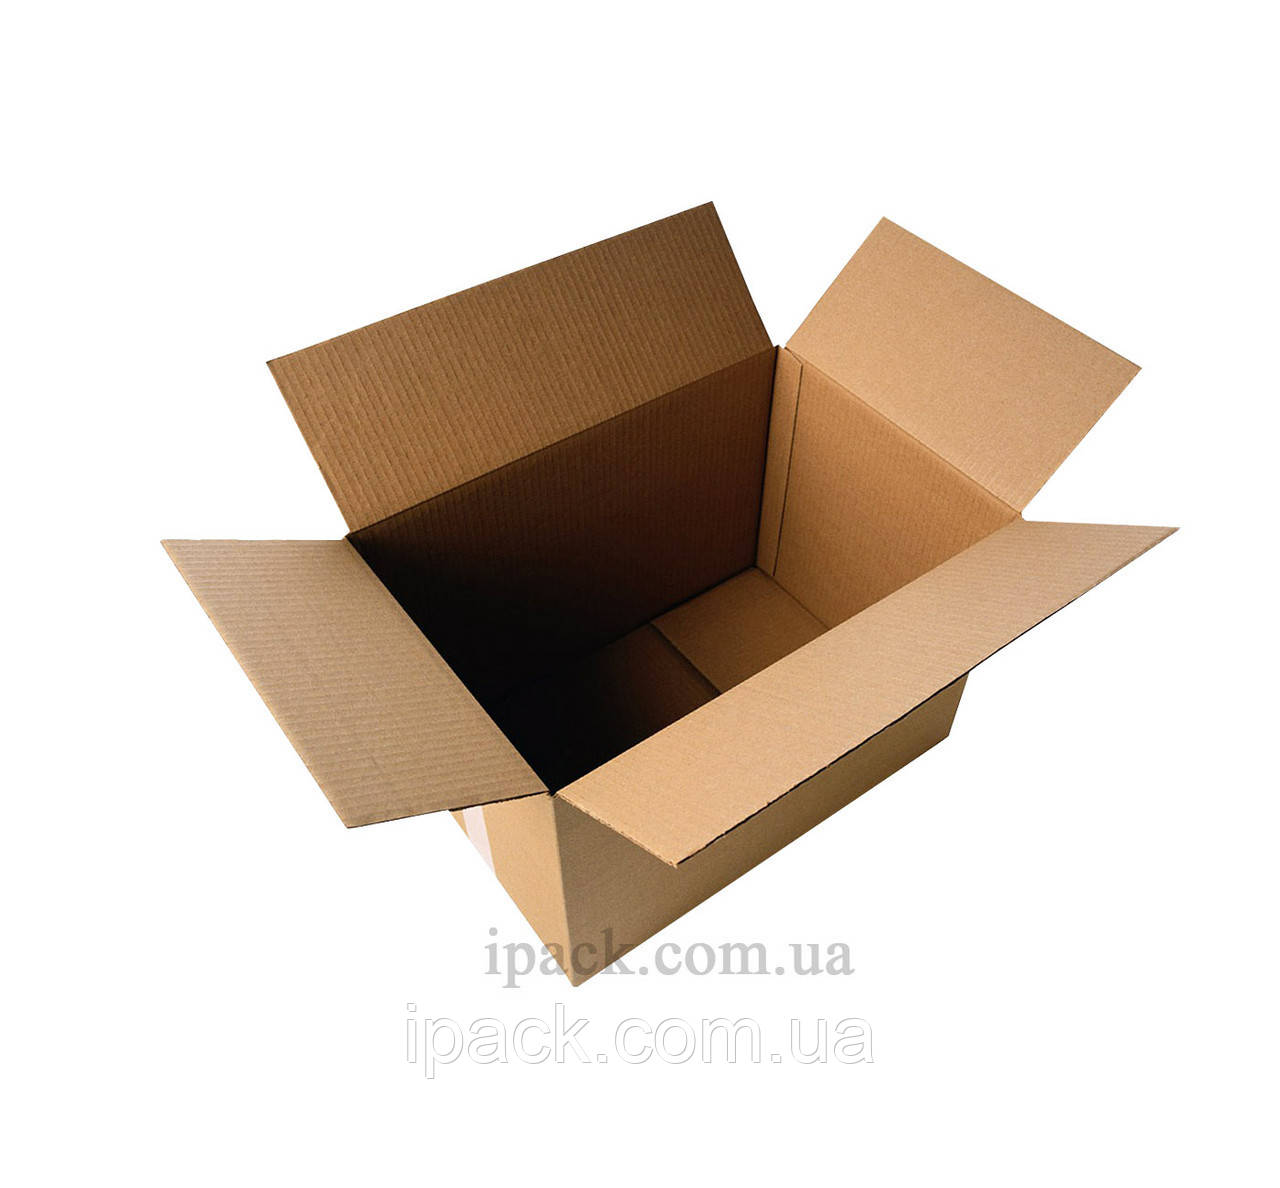 Гофроящик 435*220*235 мм бурый четырехклапанный картонный короб